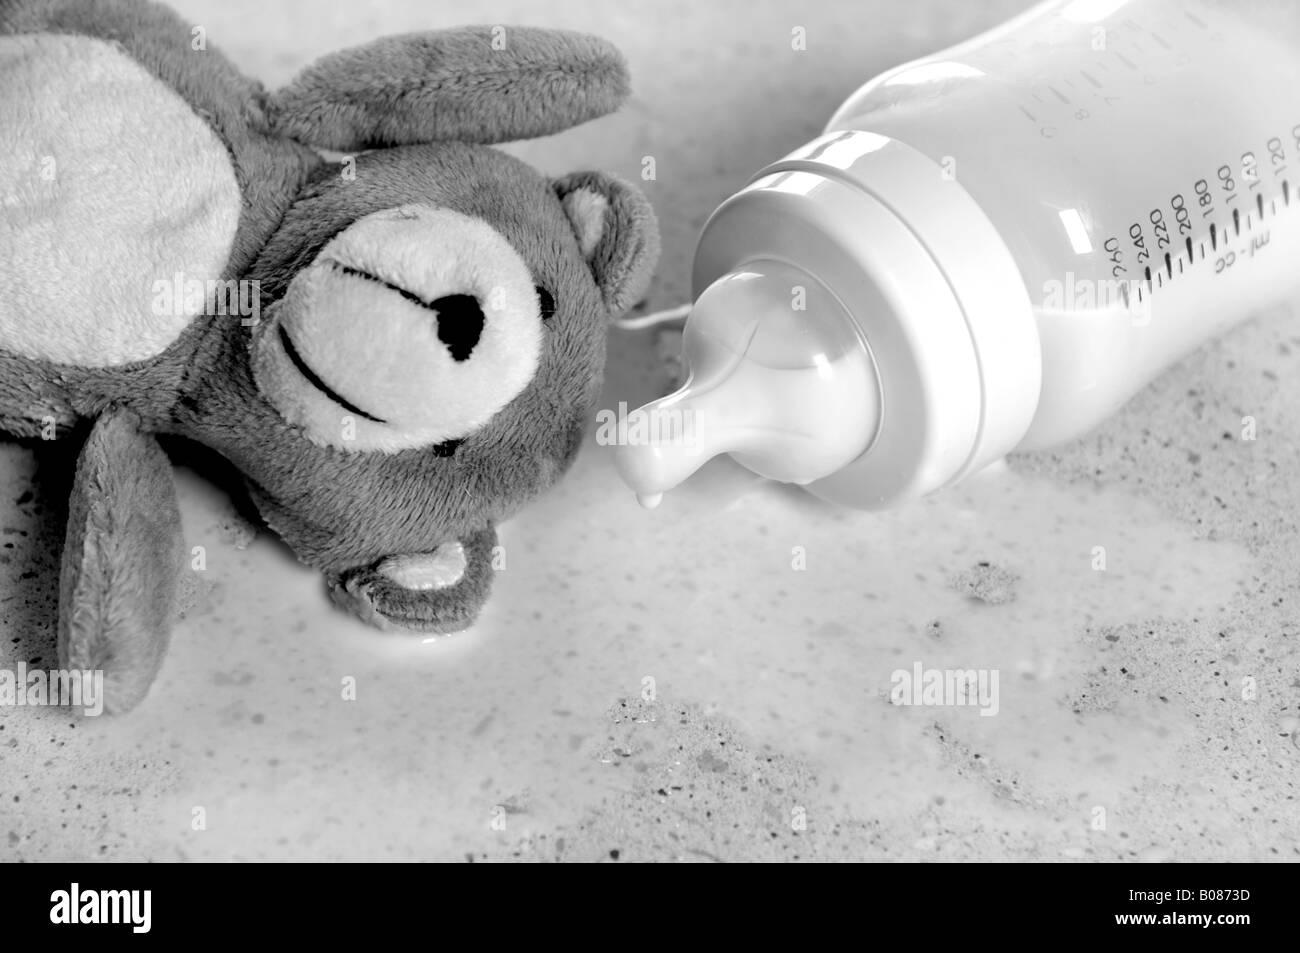 a teddy bear and a spilt bottle of baby milk - Stock Image